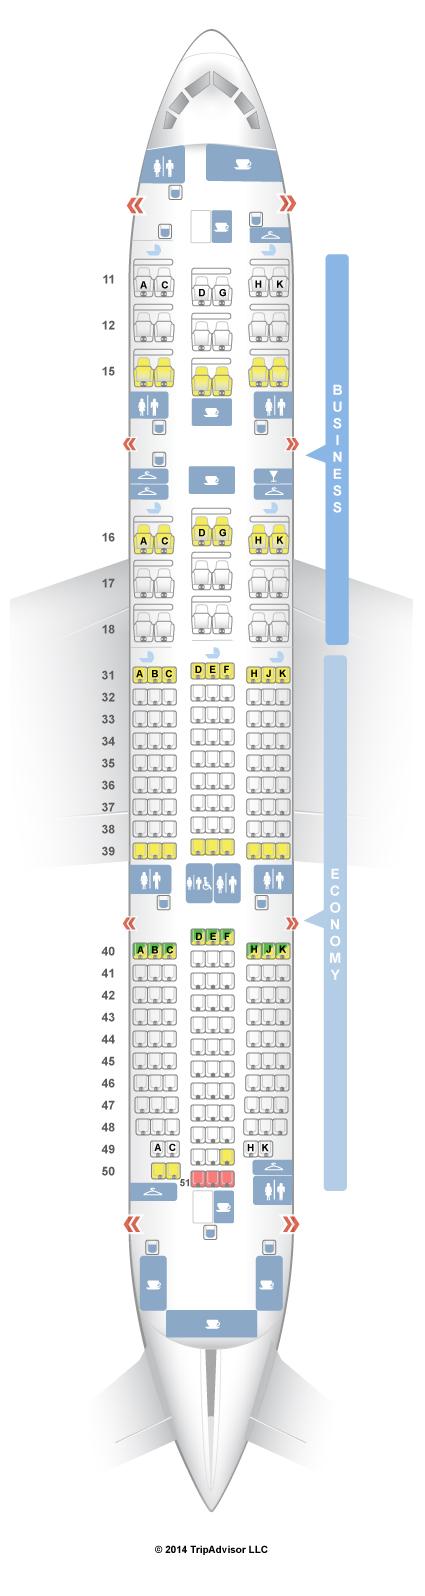 SeatGuru Seat Map Hainan Airlines - SeatGuru